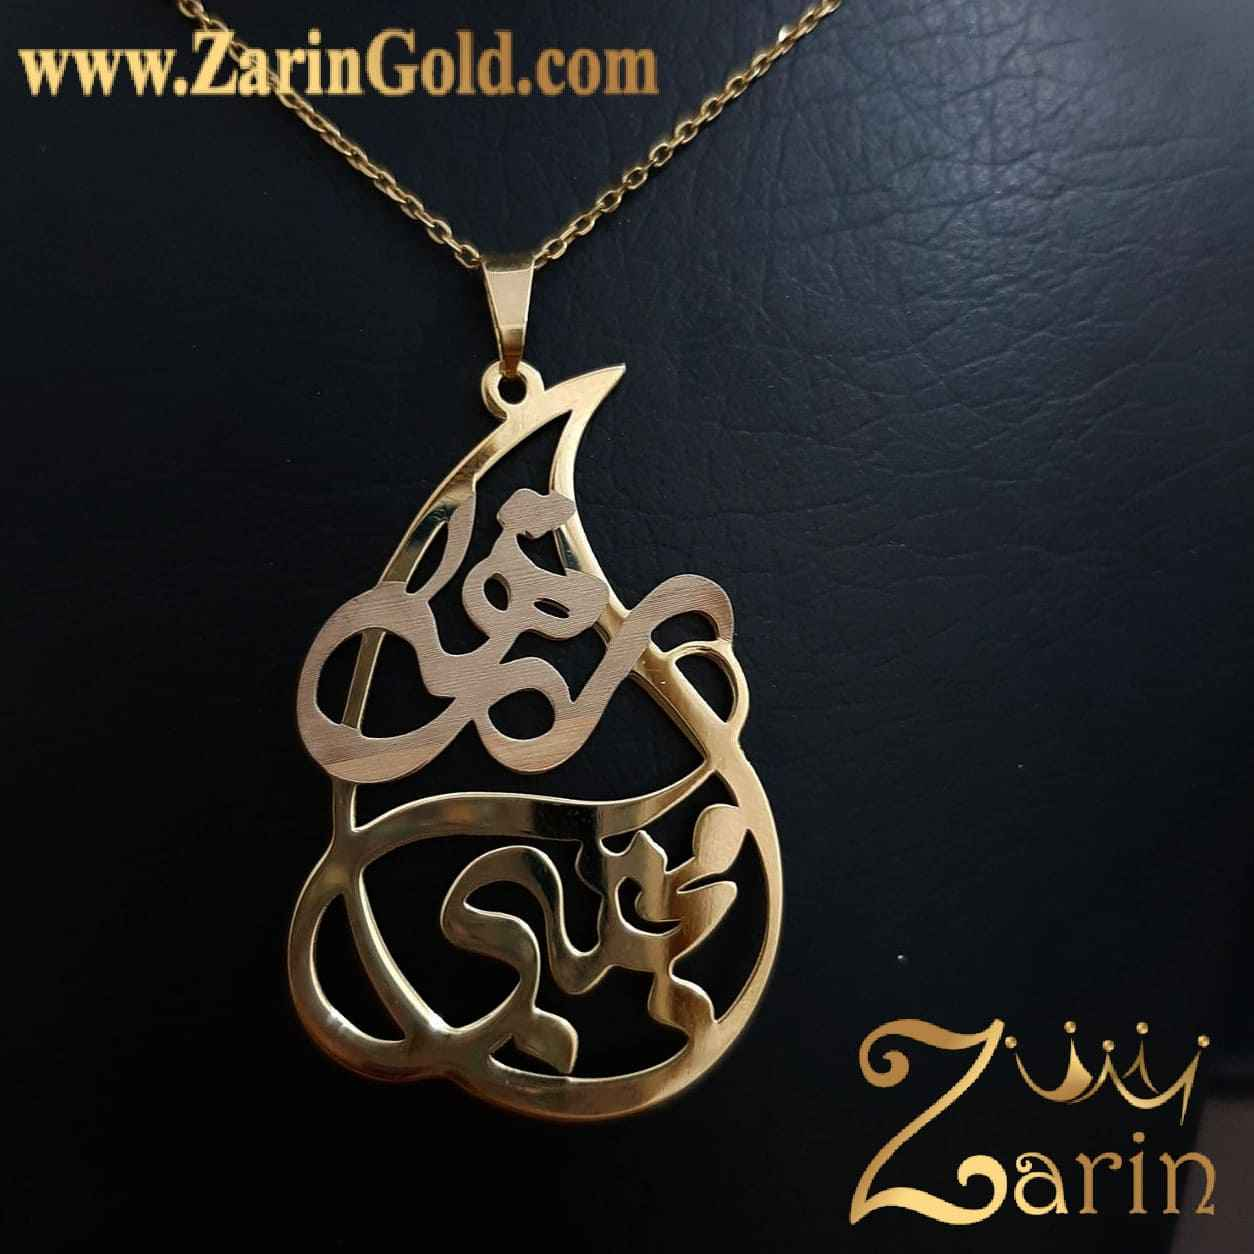 پلاک طلا دو اسم مجتبی زهرا فارسی با قاب قلب